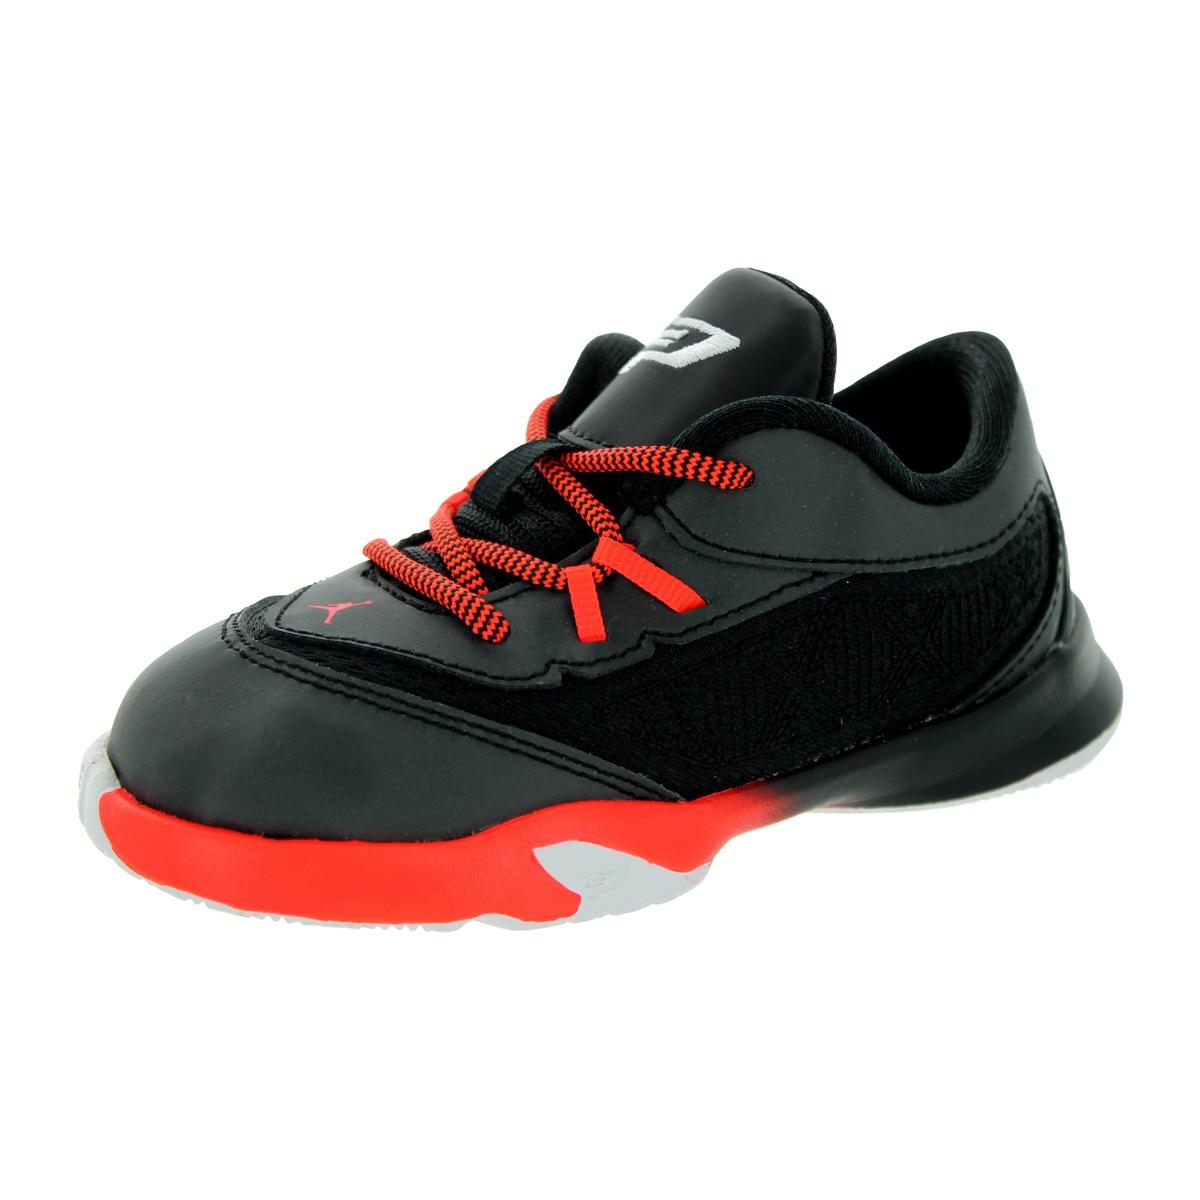 Nike Jordan Toddlers Jordan CP3.Viii Black/Infrared Baske...